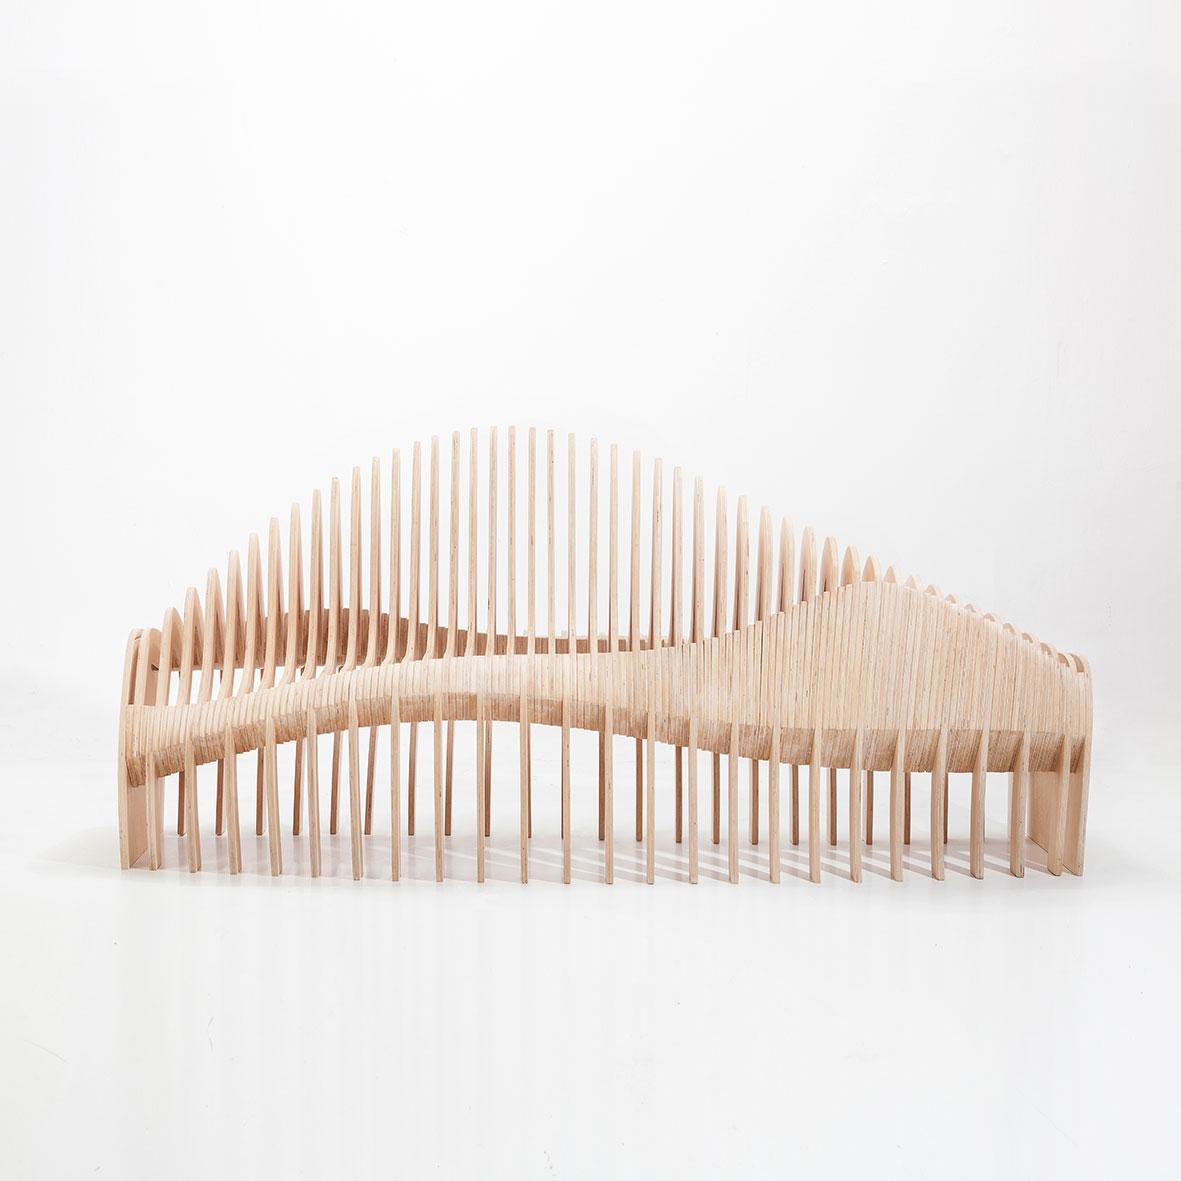 Benchsaurus by Alain Bernard y Javier Zaratiegui - Creative Work